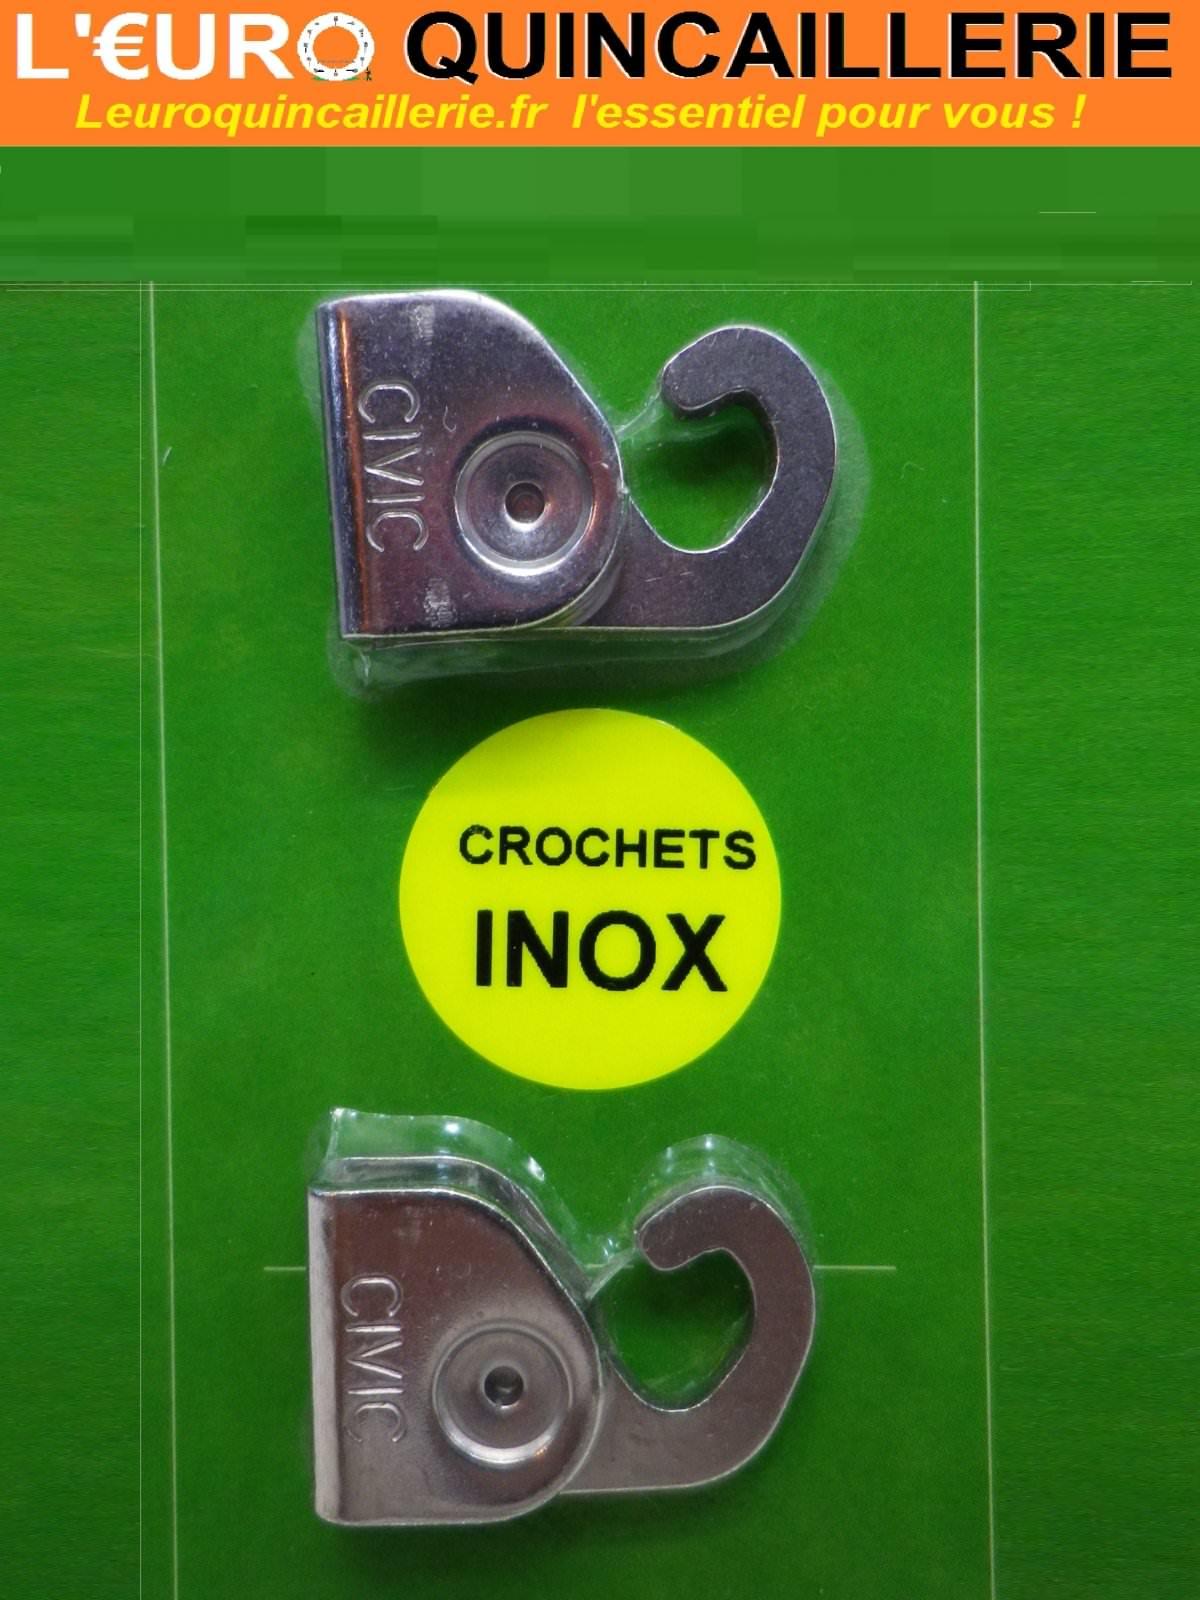 2 Crochets inox universels de cimaise